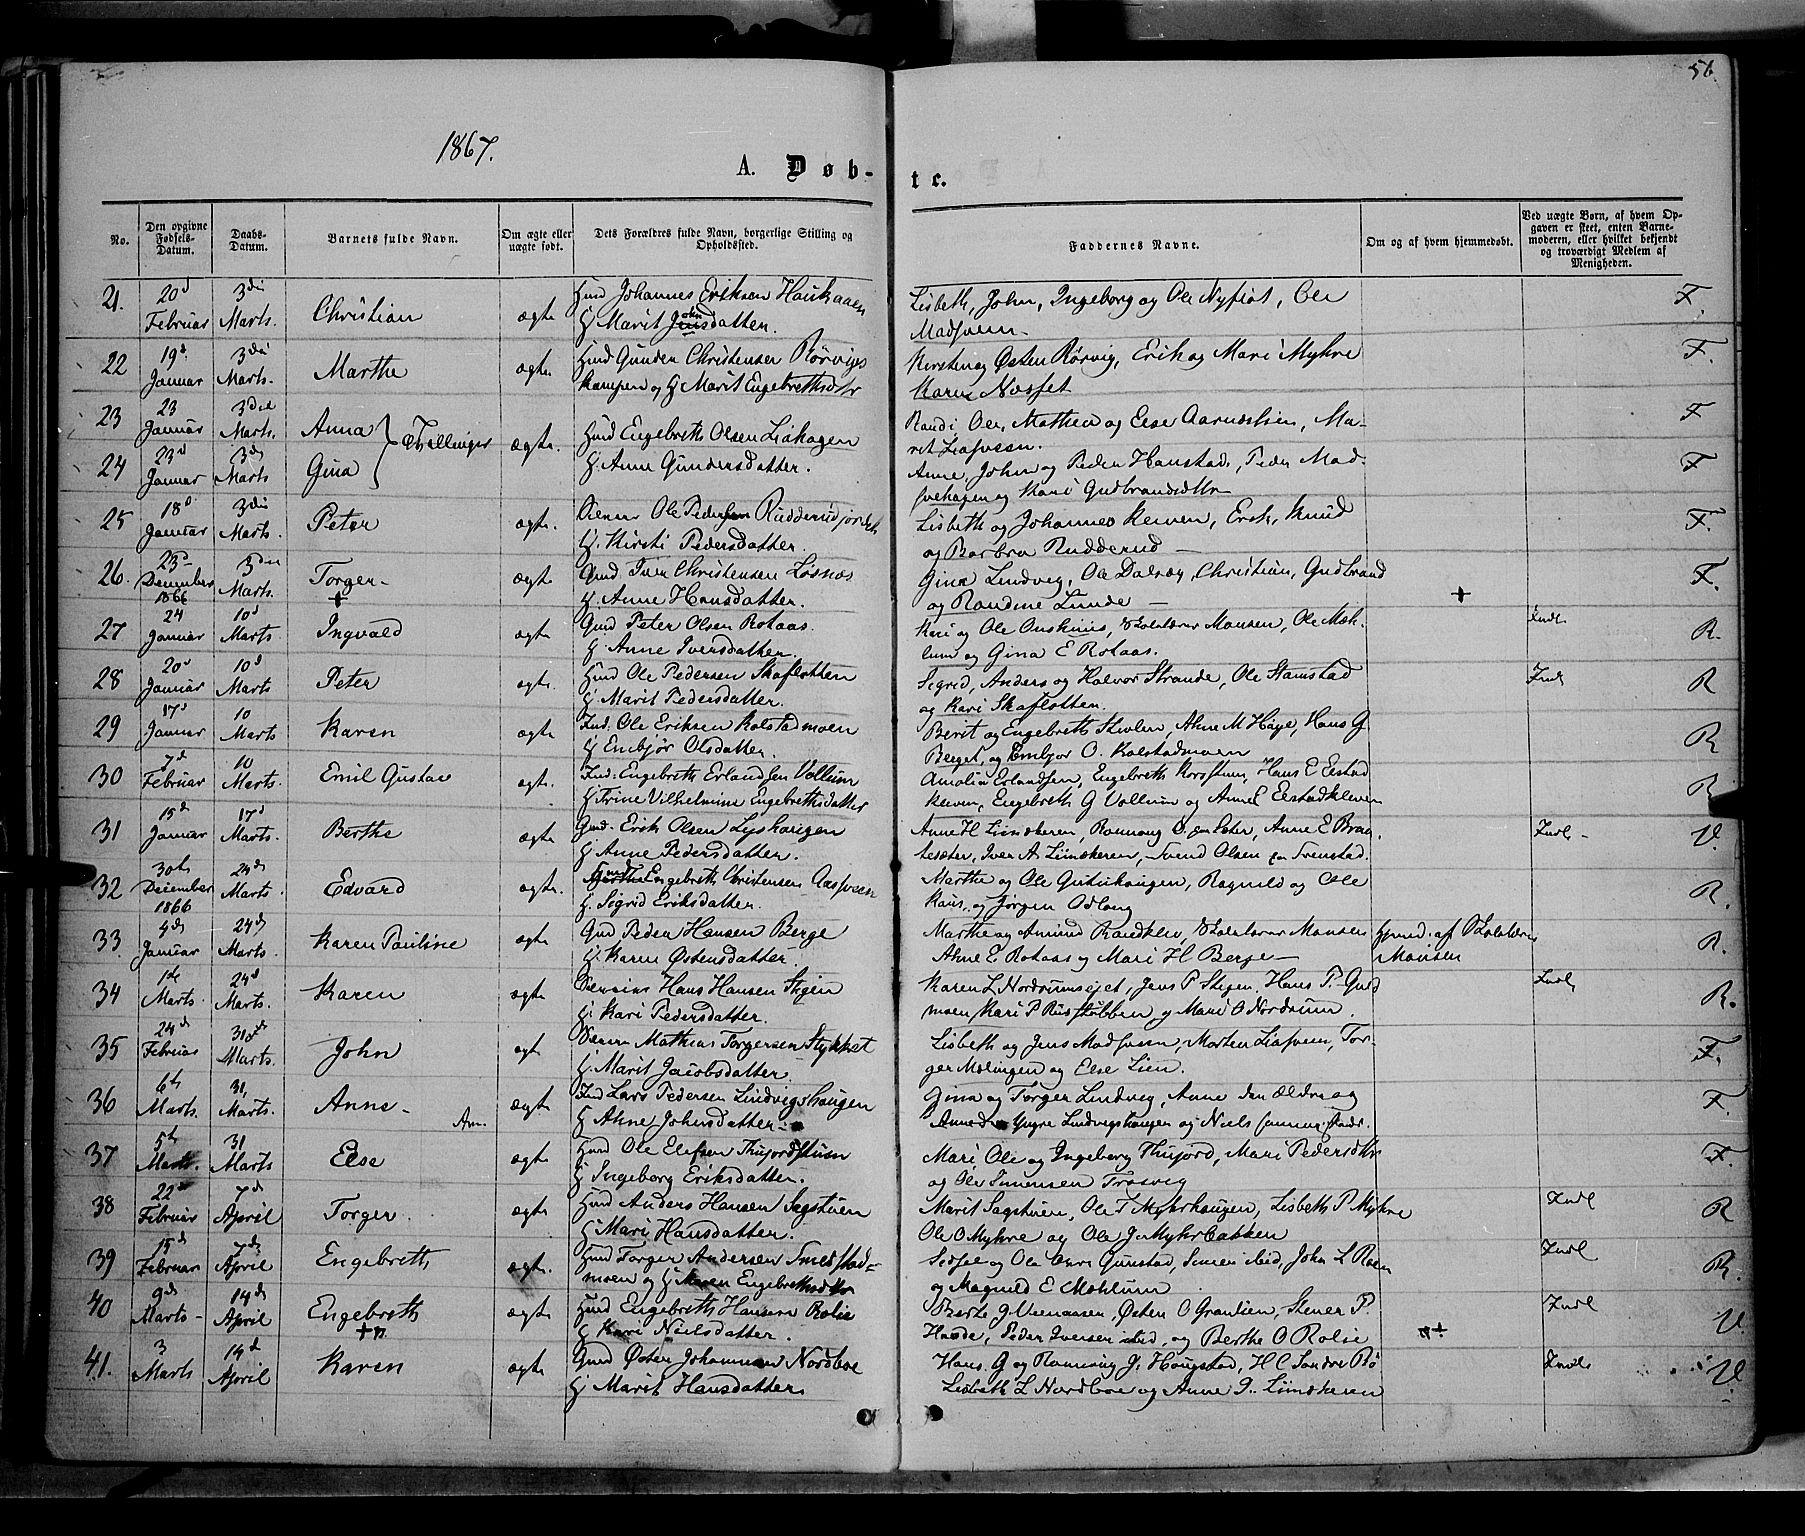 SAH, Ringebu prestekontor, Ministerialbok nr. 7, 1860-1877, s. 56